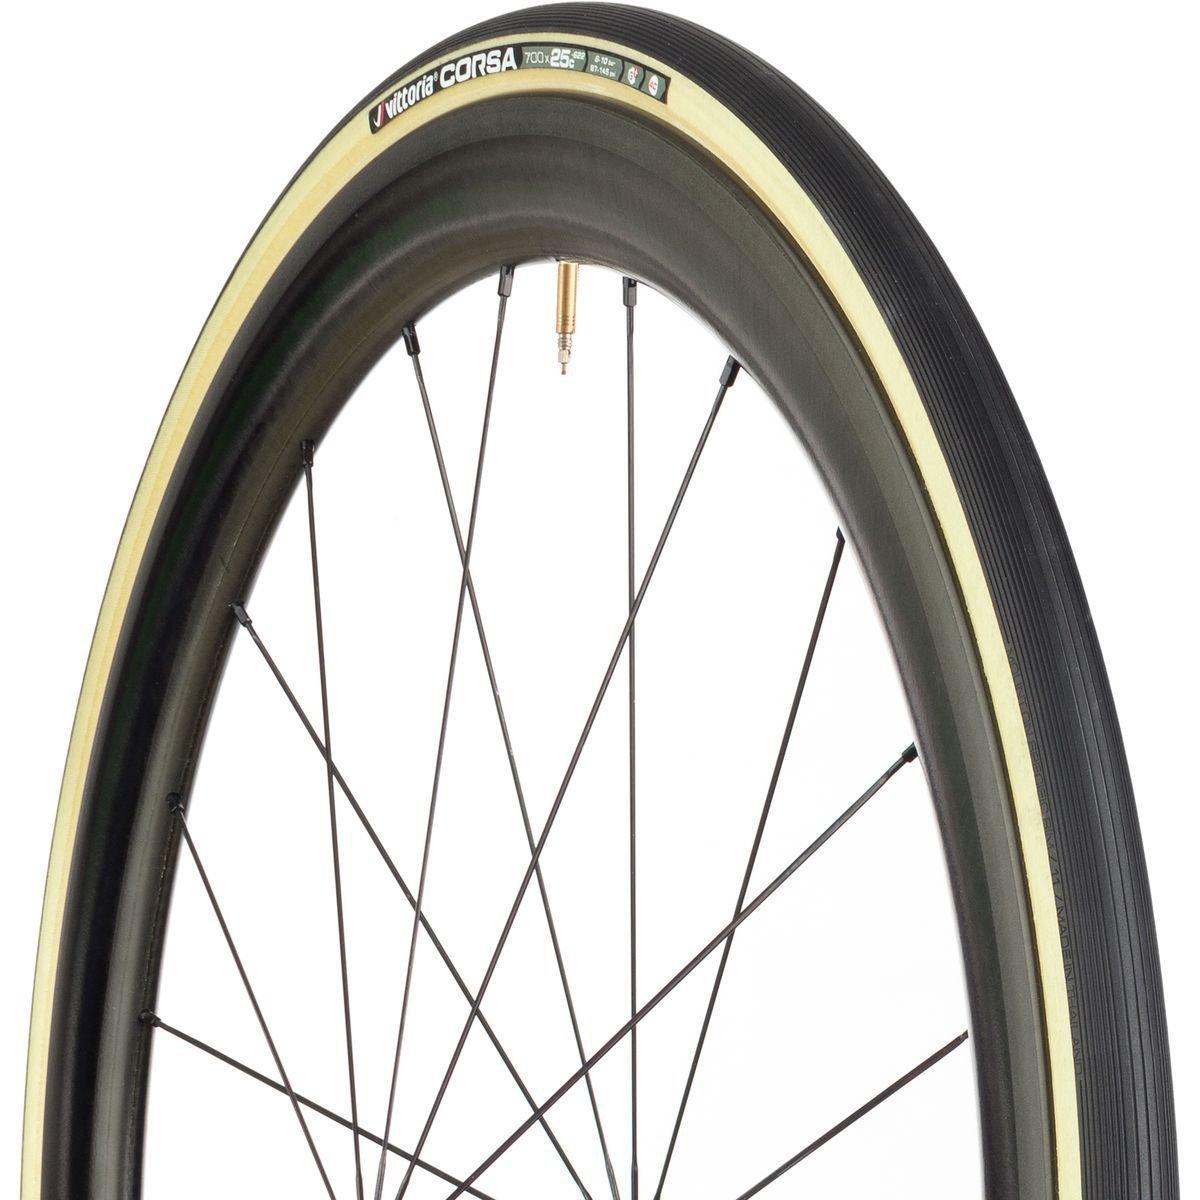 Vittoria Corsa G+ Graphene Road Tire, Skinwall/Black, 700x25mm